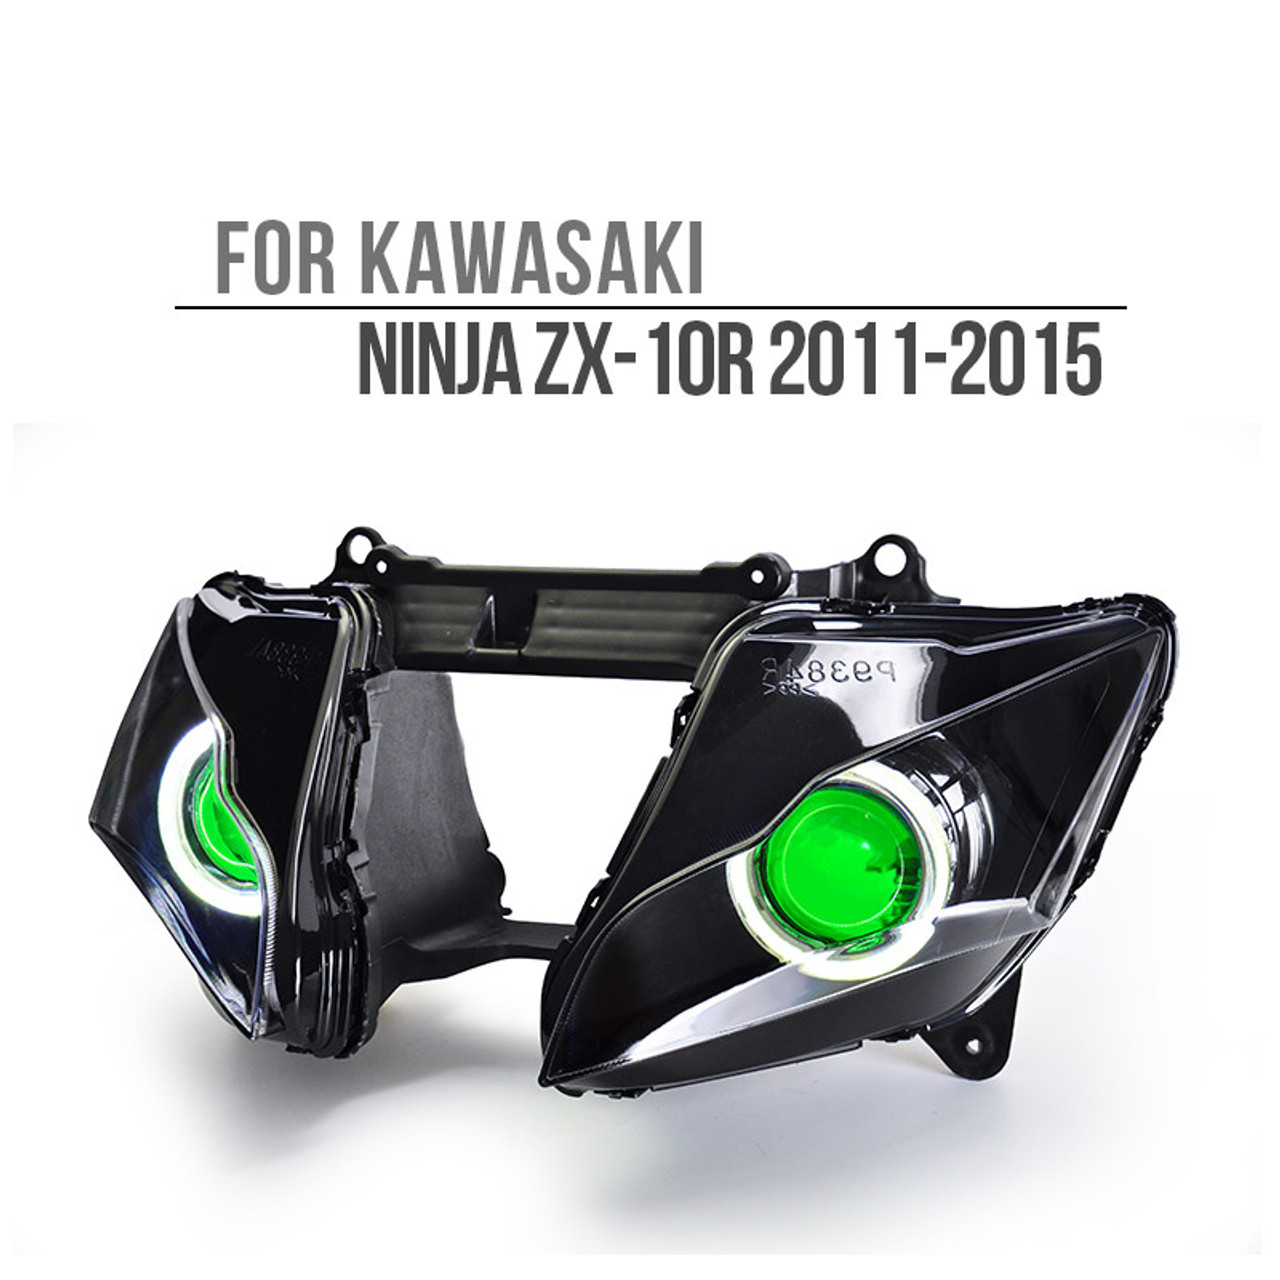 Kawasaki Ninja Zx10r Led Headlight 2011 2012 2013 2014 2015